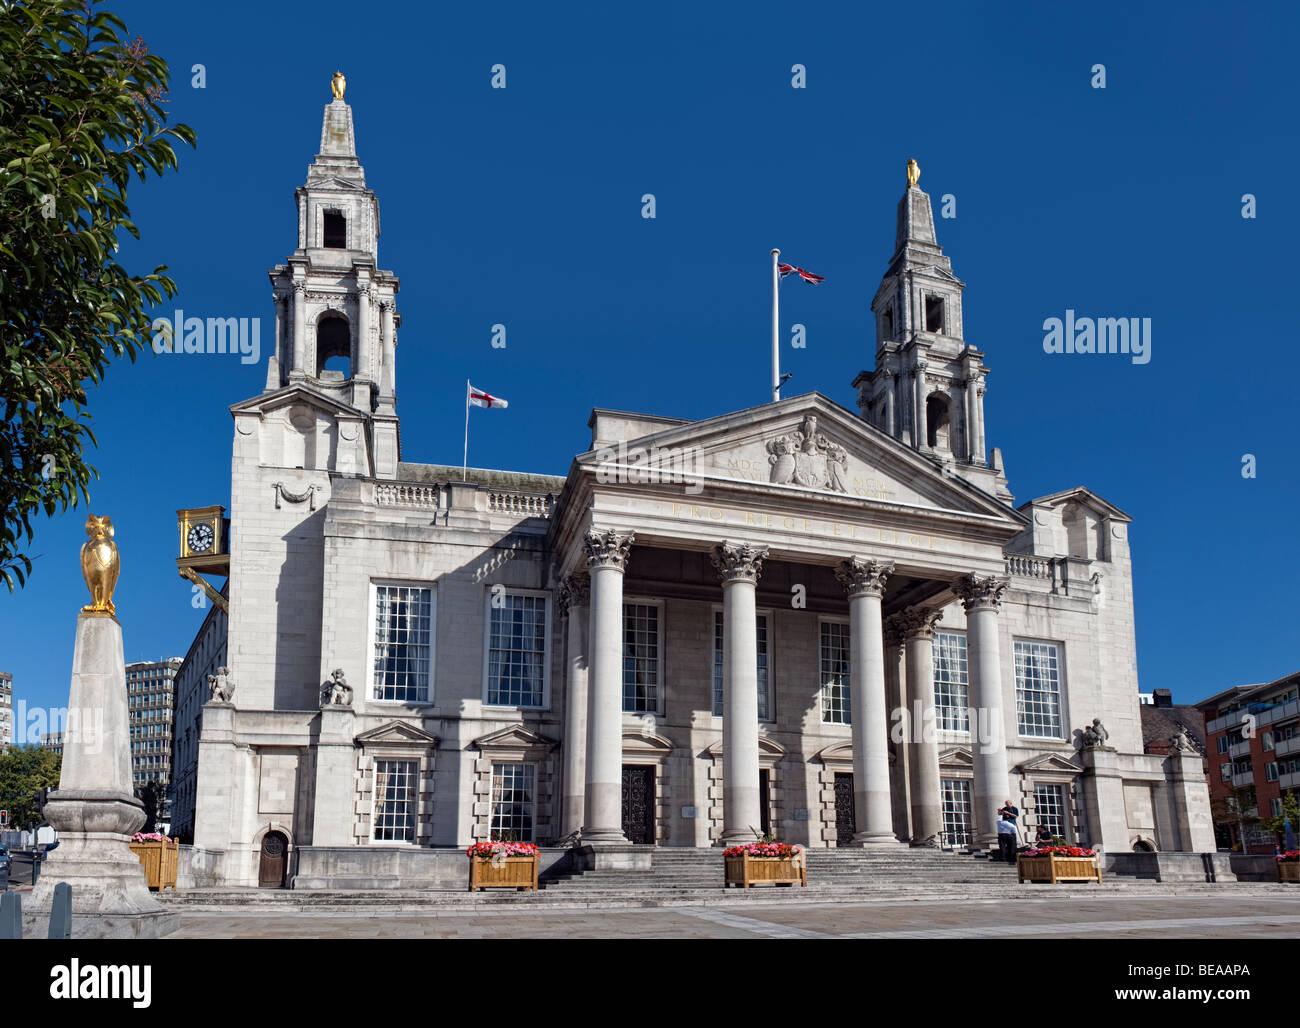 Leeds Civic Hall, overlooking Millennium Square, Leeds, West Yorkshire UK - Stock Image